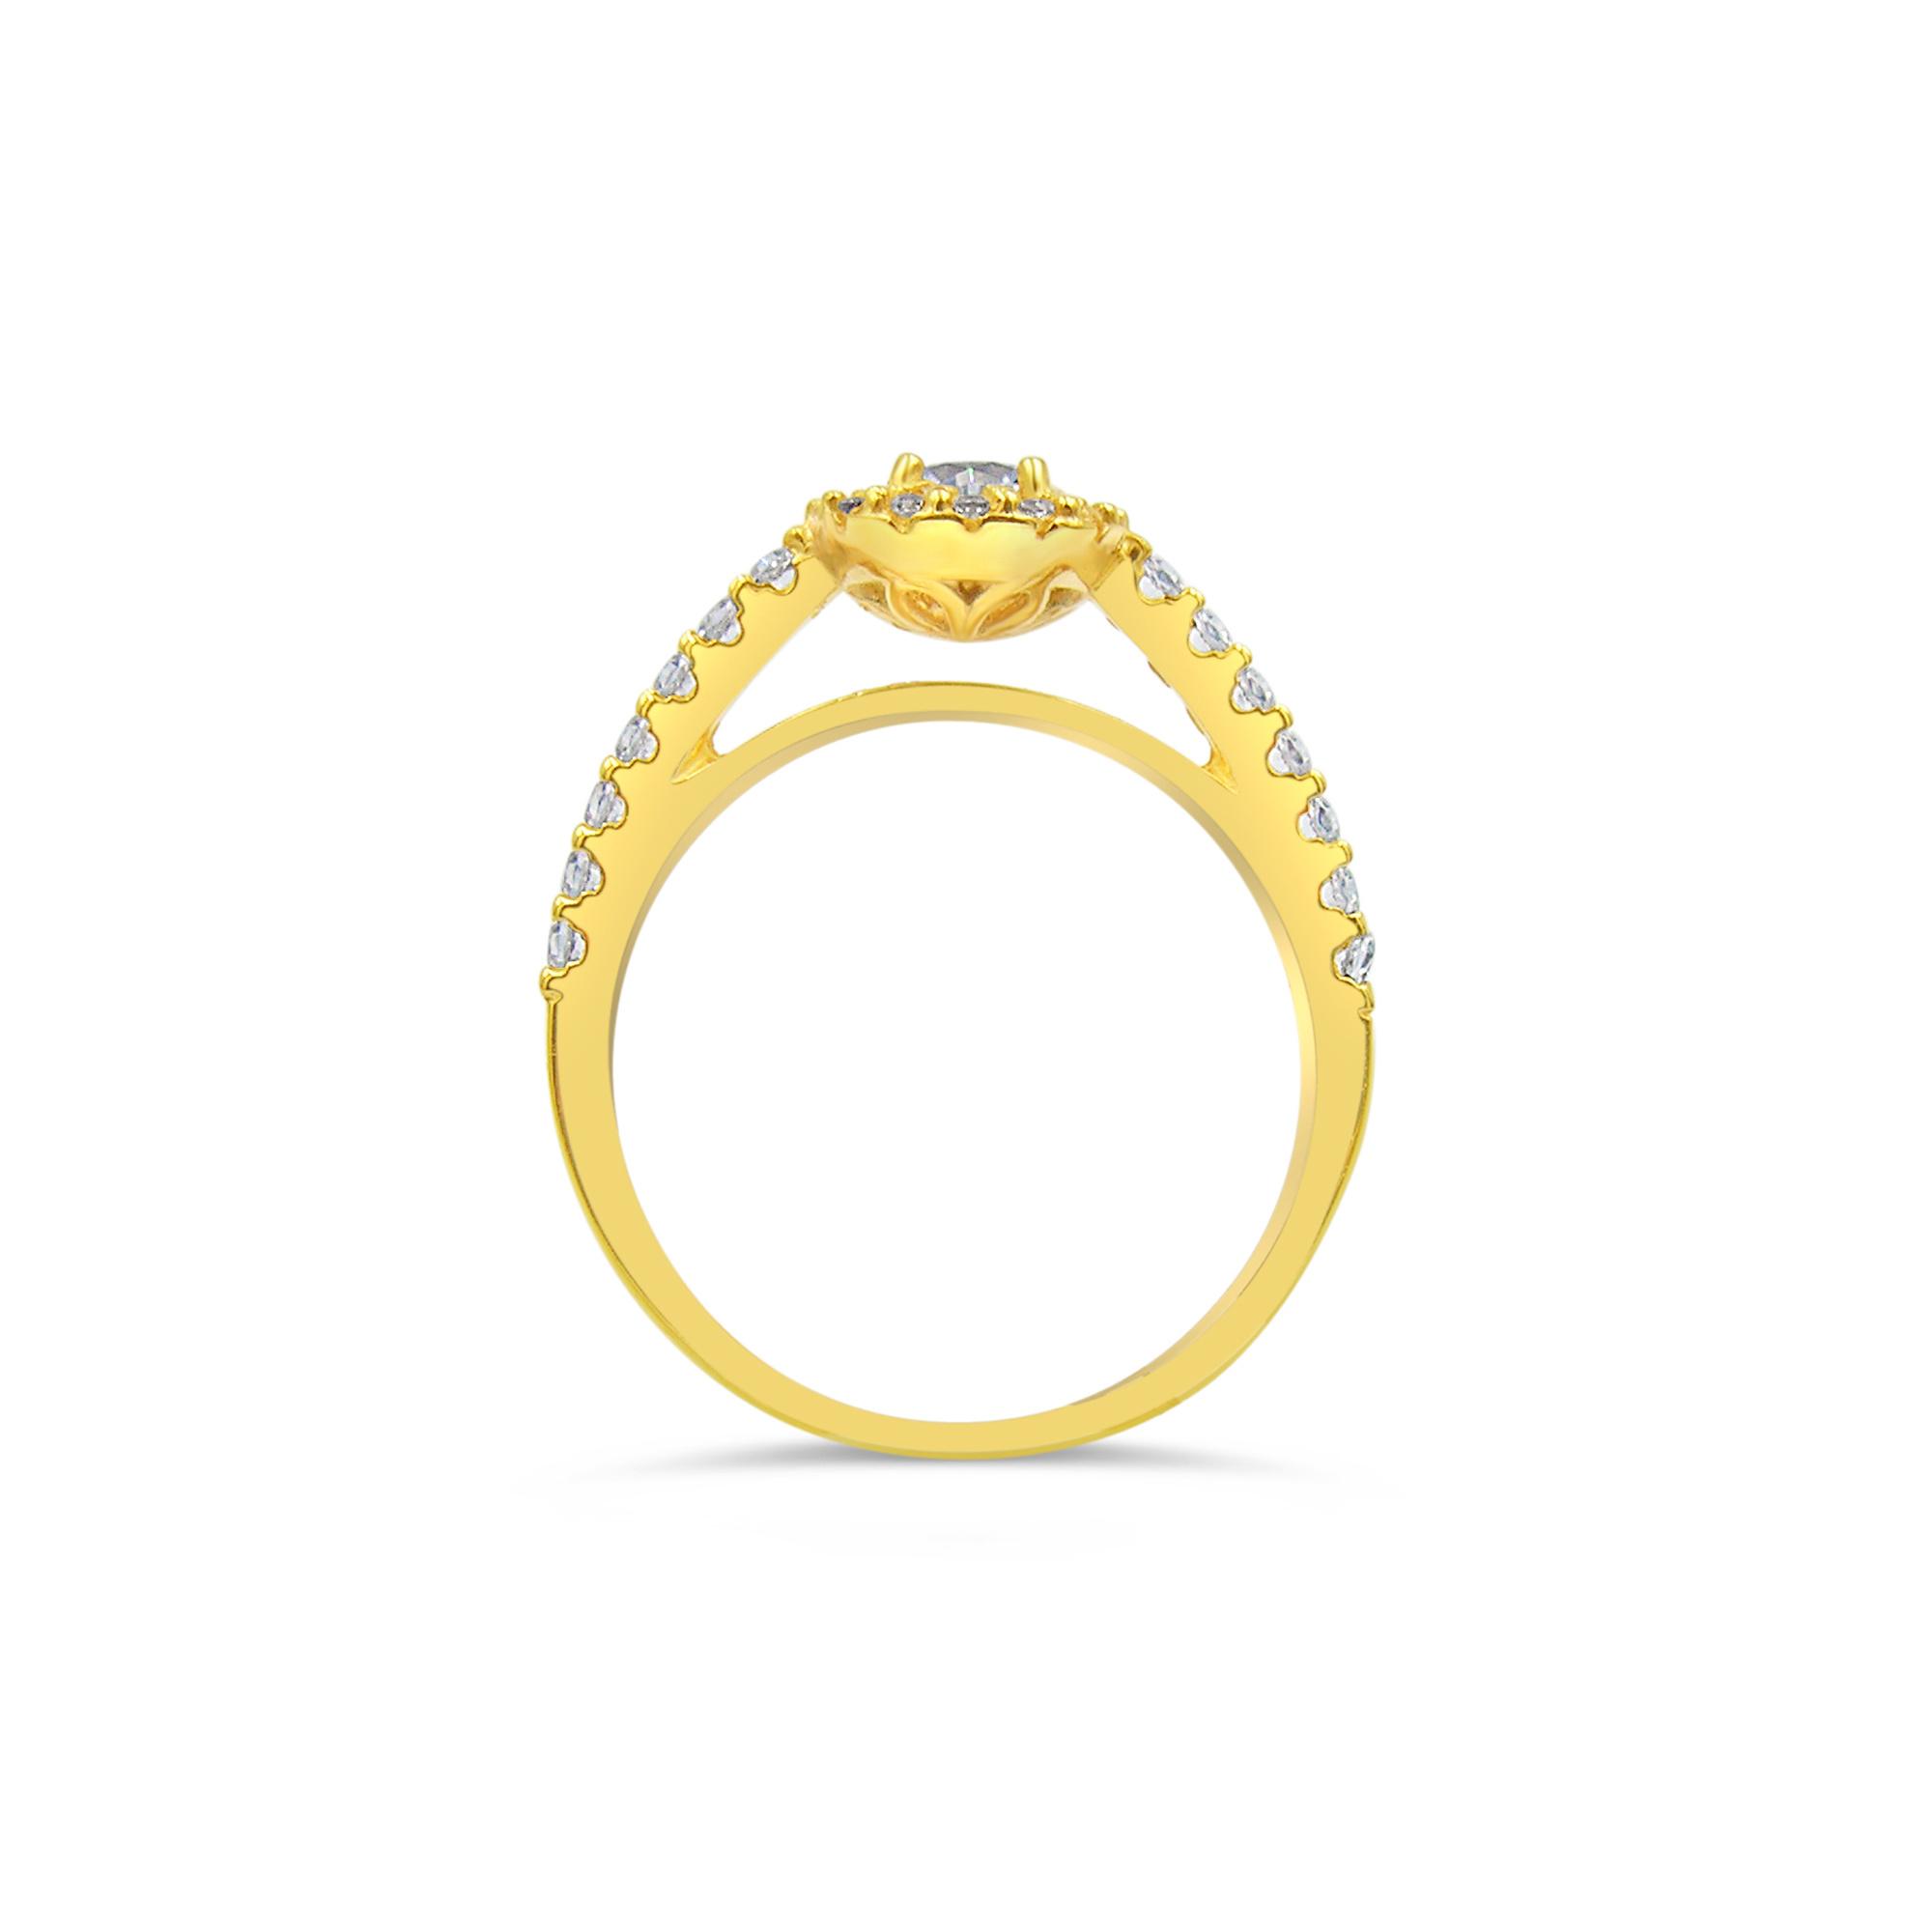 18kt geel goud verlovingsring met zirkonia